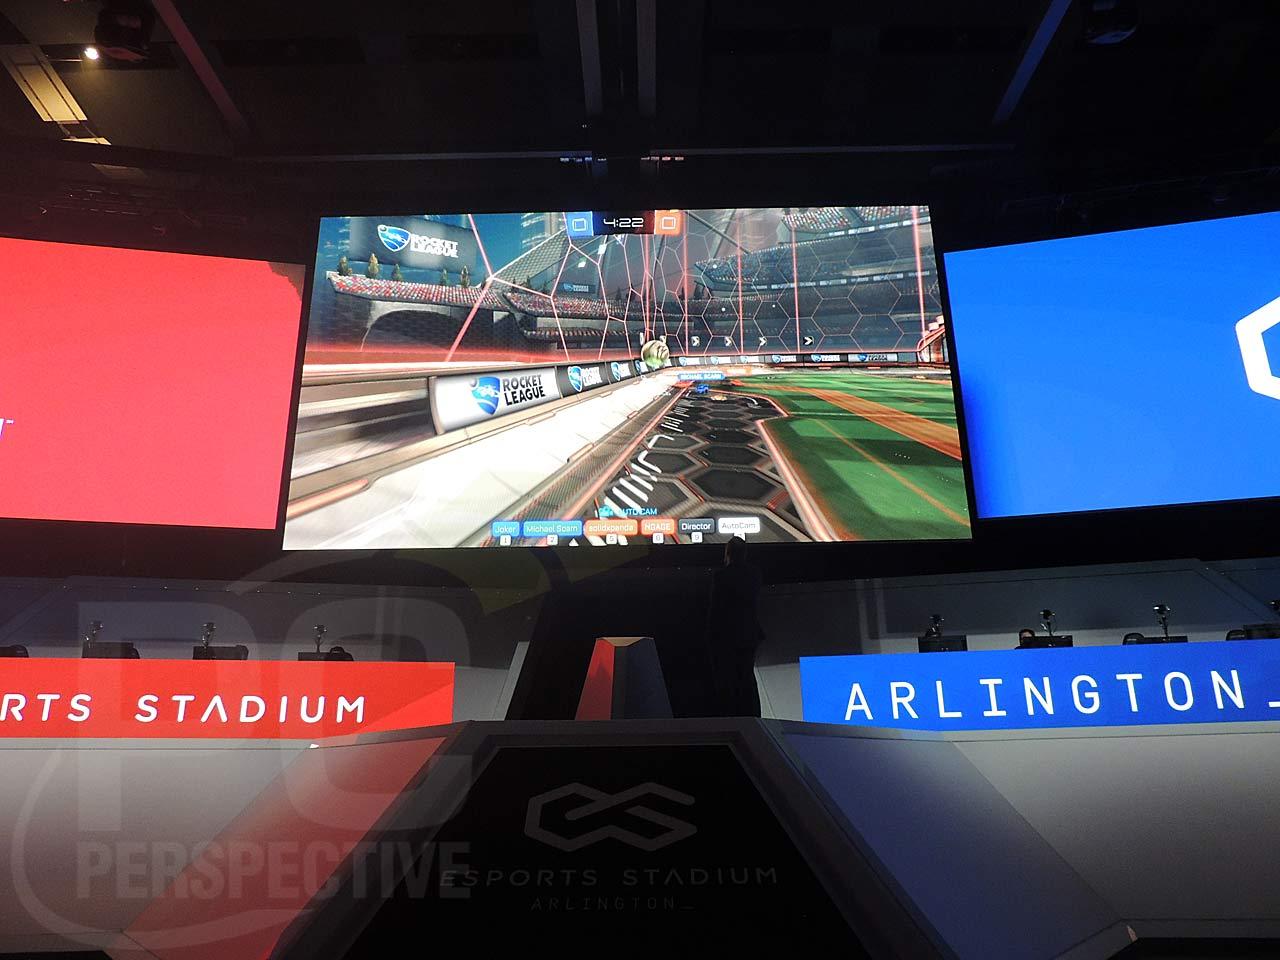 23-esport-stadium-play-in-game.jpg